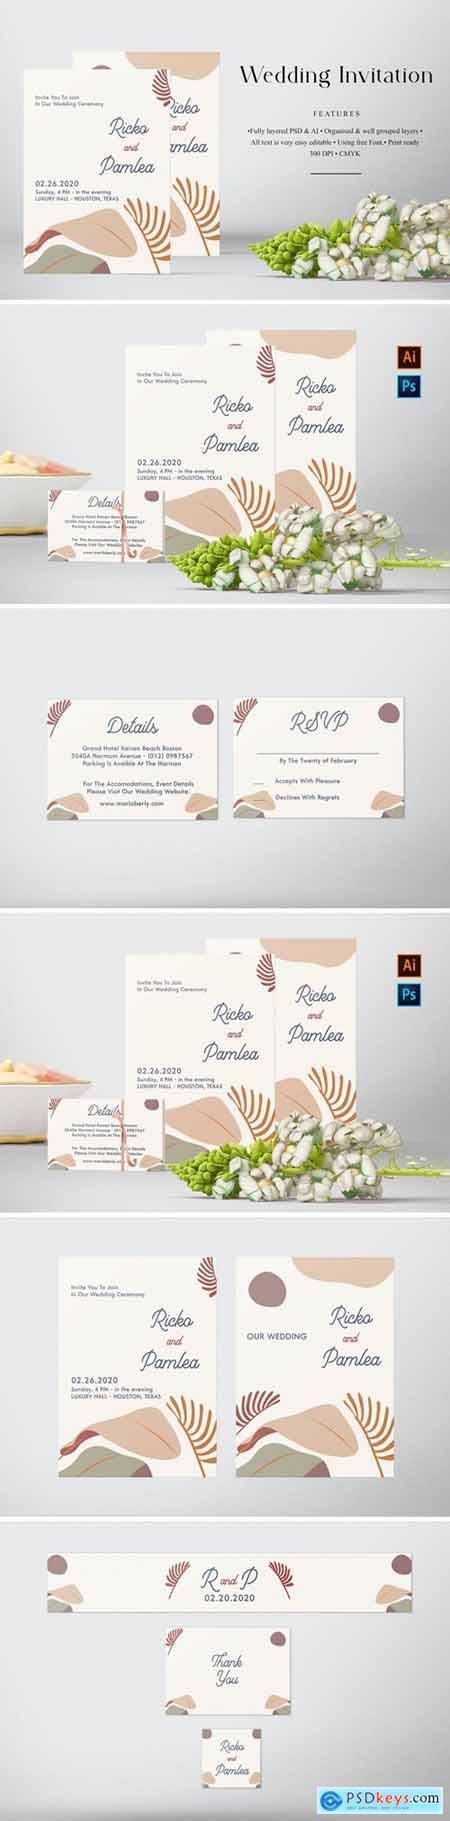 Ricko and Pamlea Wedding Invitation